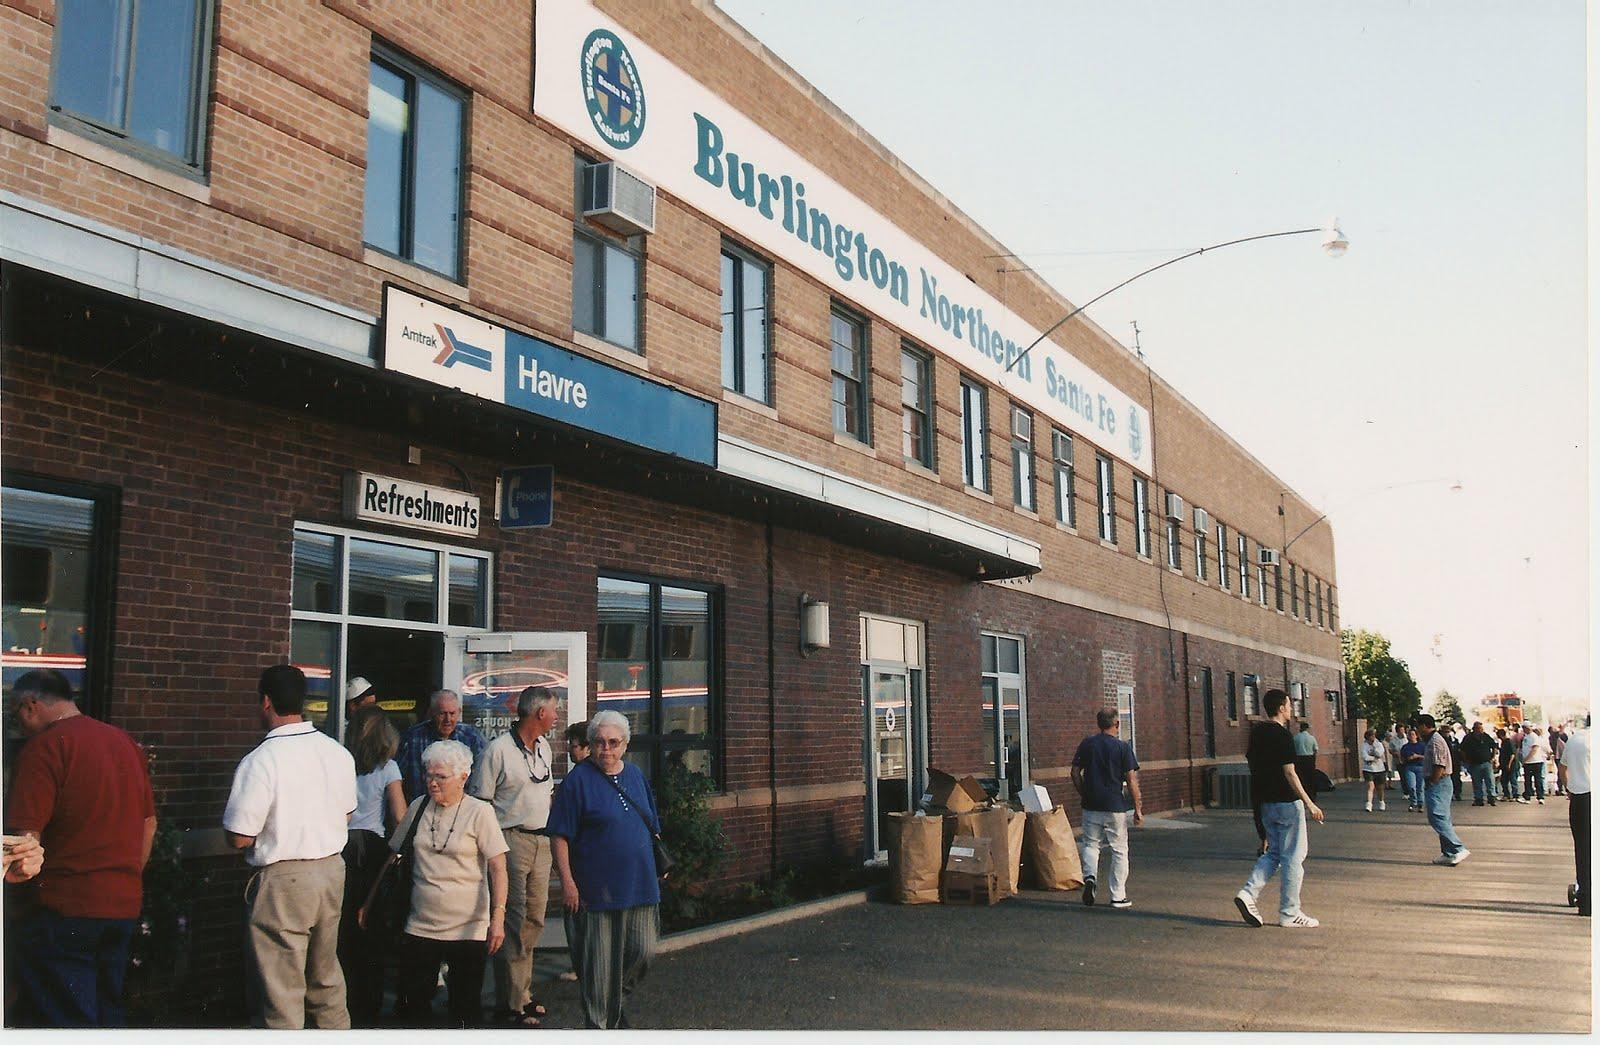 Railway stations usa havre havre amtrak station montana usa havre havre amtrak station montana sciox Choice Image